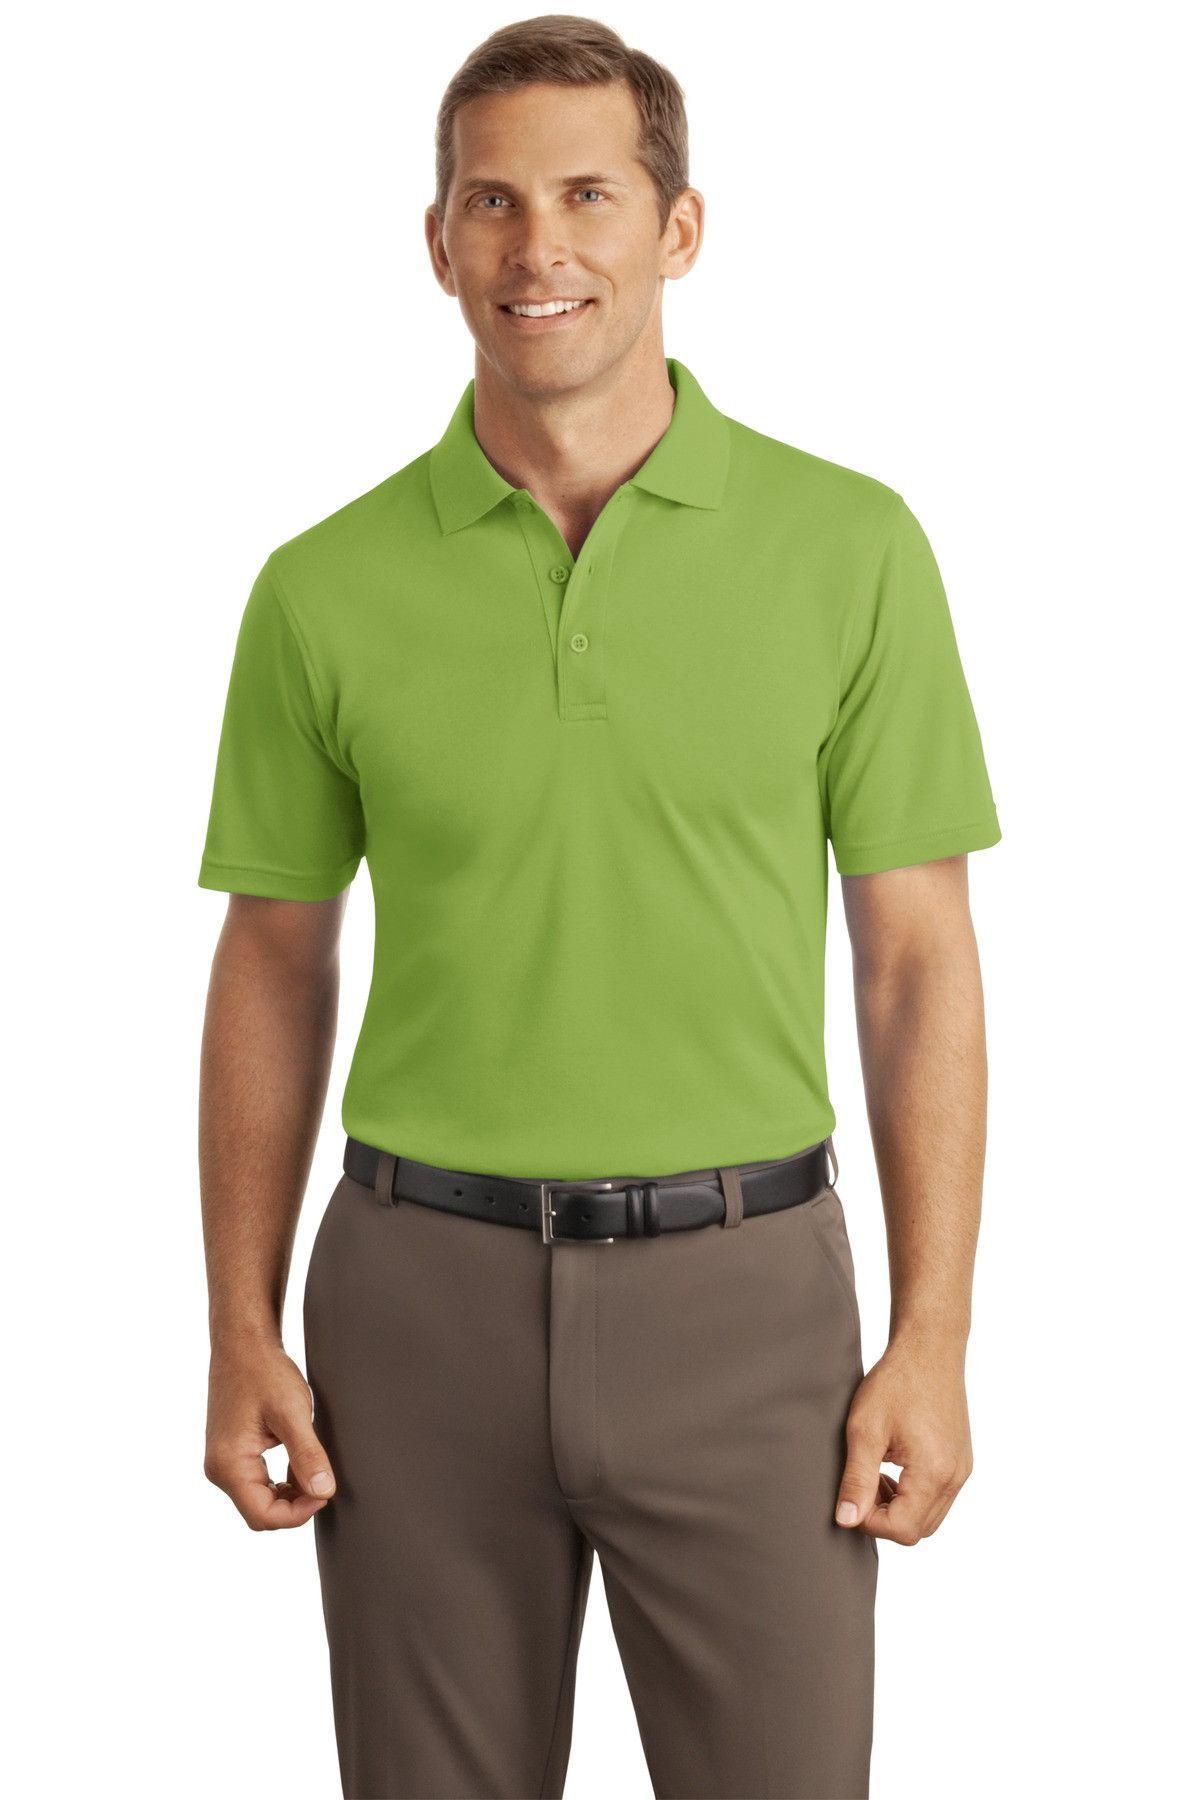 Port Authority Silk Touch™ Interlock Polo K520 Leaf Green